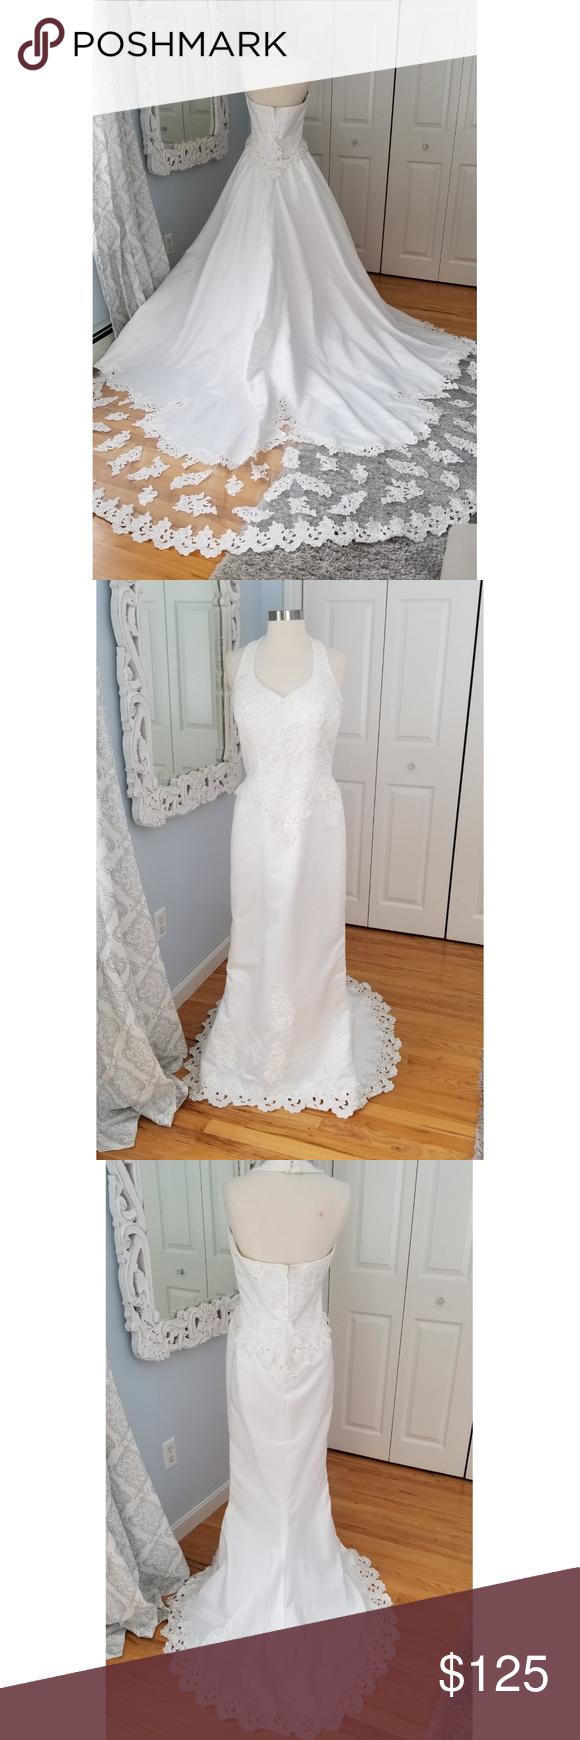 Michaelangelo Wedding Gown Wedding Gowns Wedding Dresses Lace Wedding